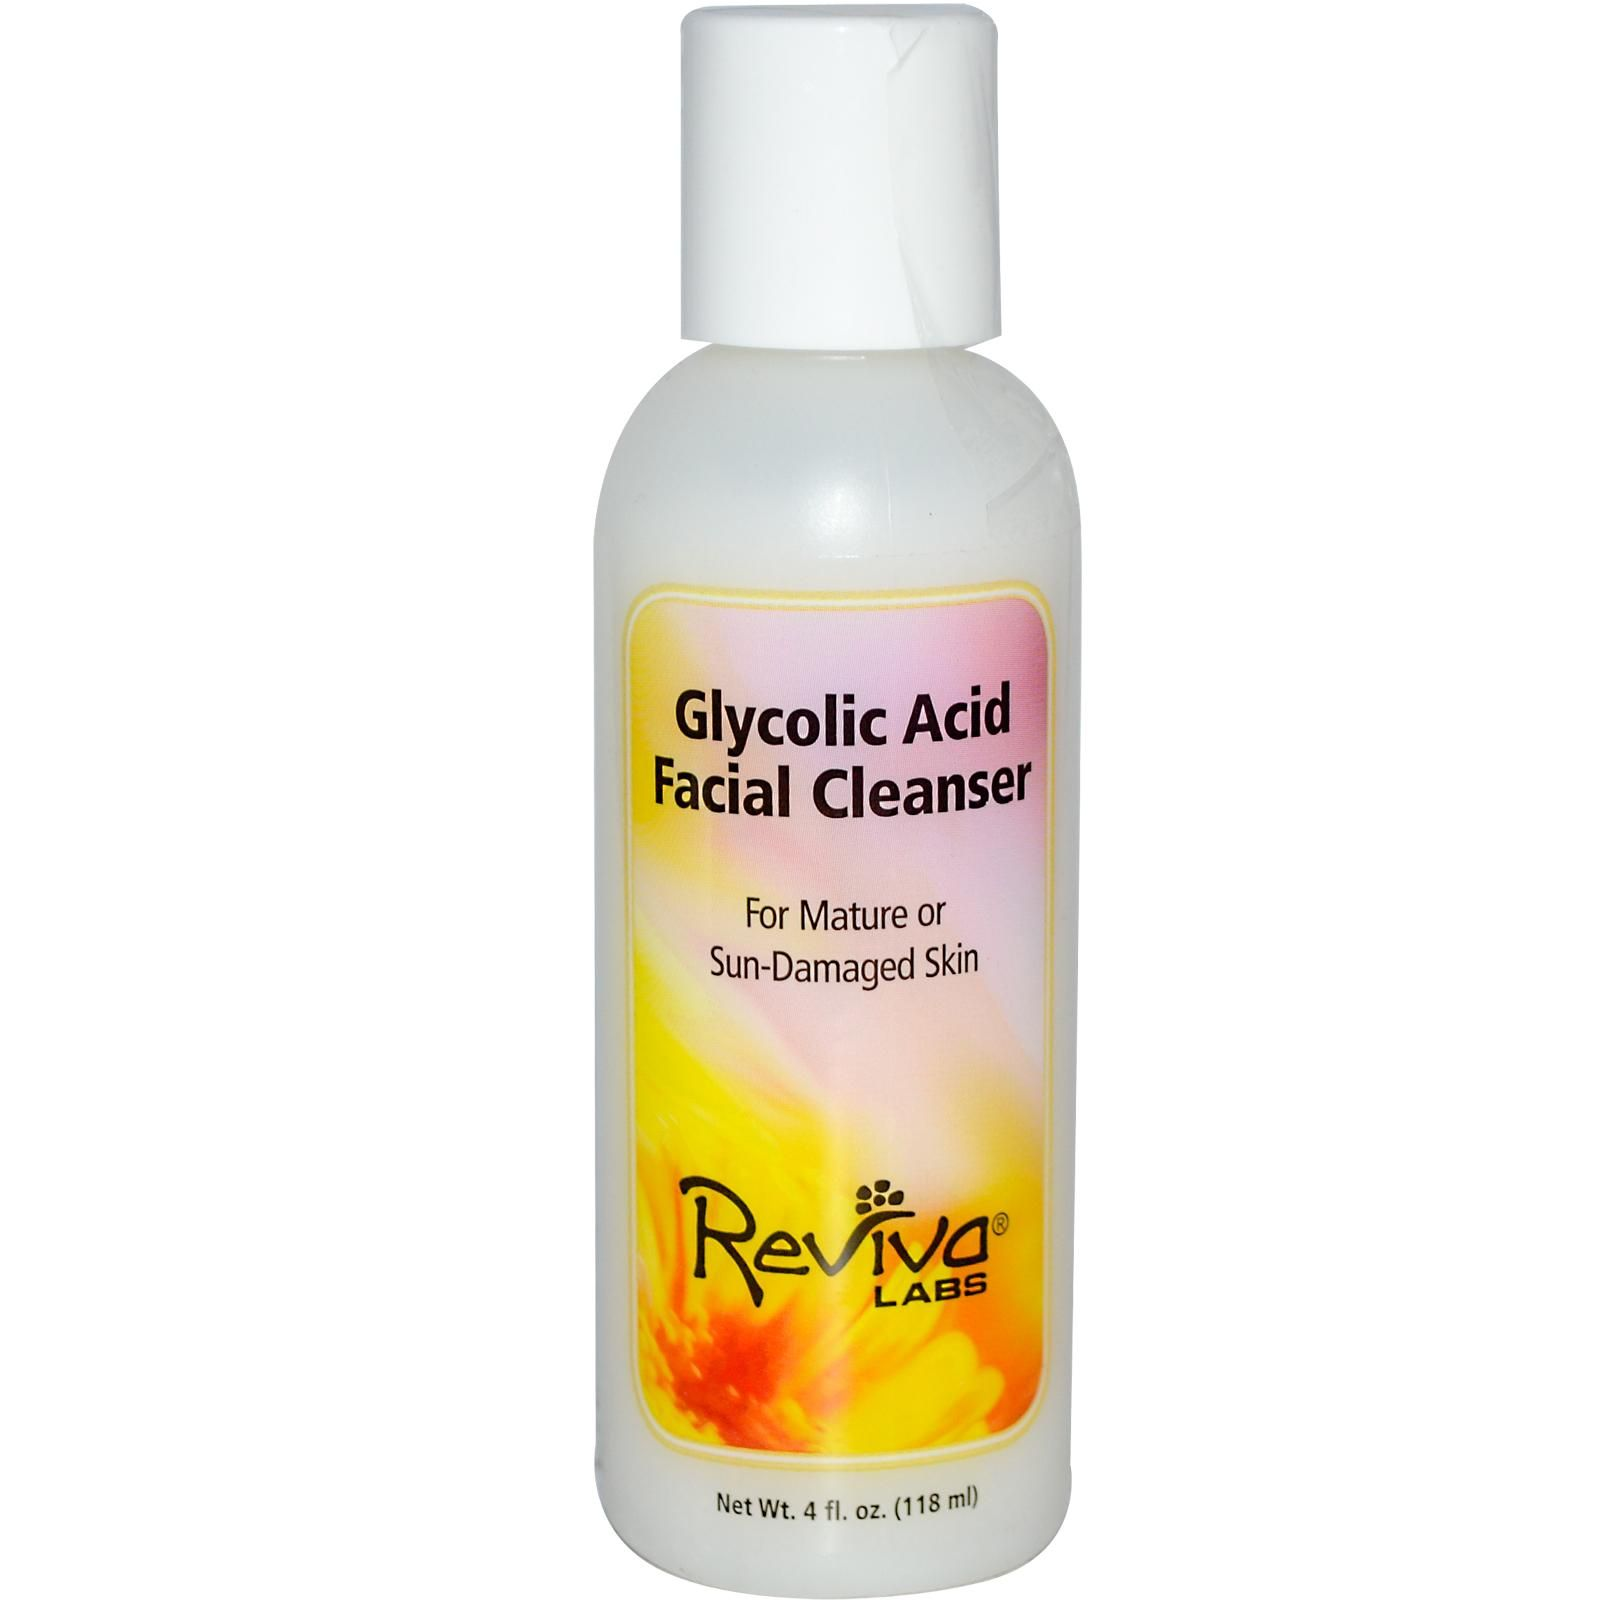 Reviva Labs, Glycolic Acid Facial Cleanser, 4 fl oz (118 ml) - iHerb.com